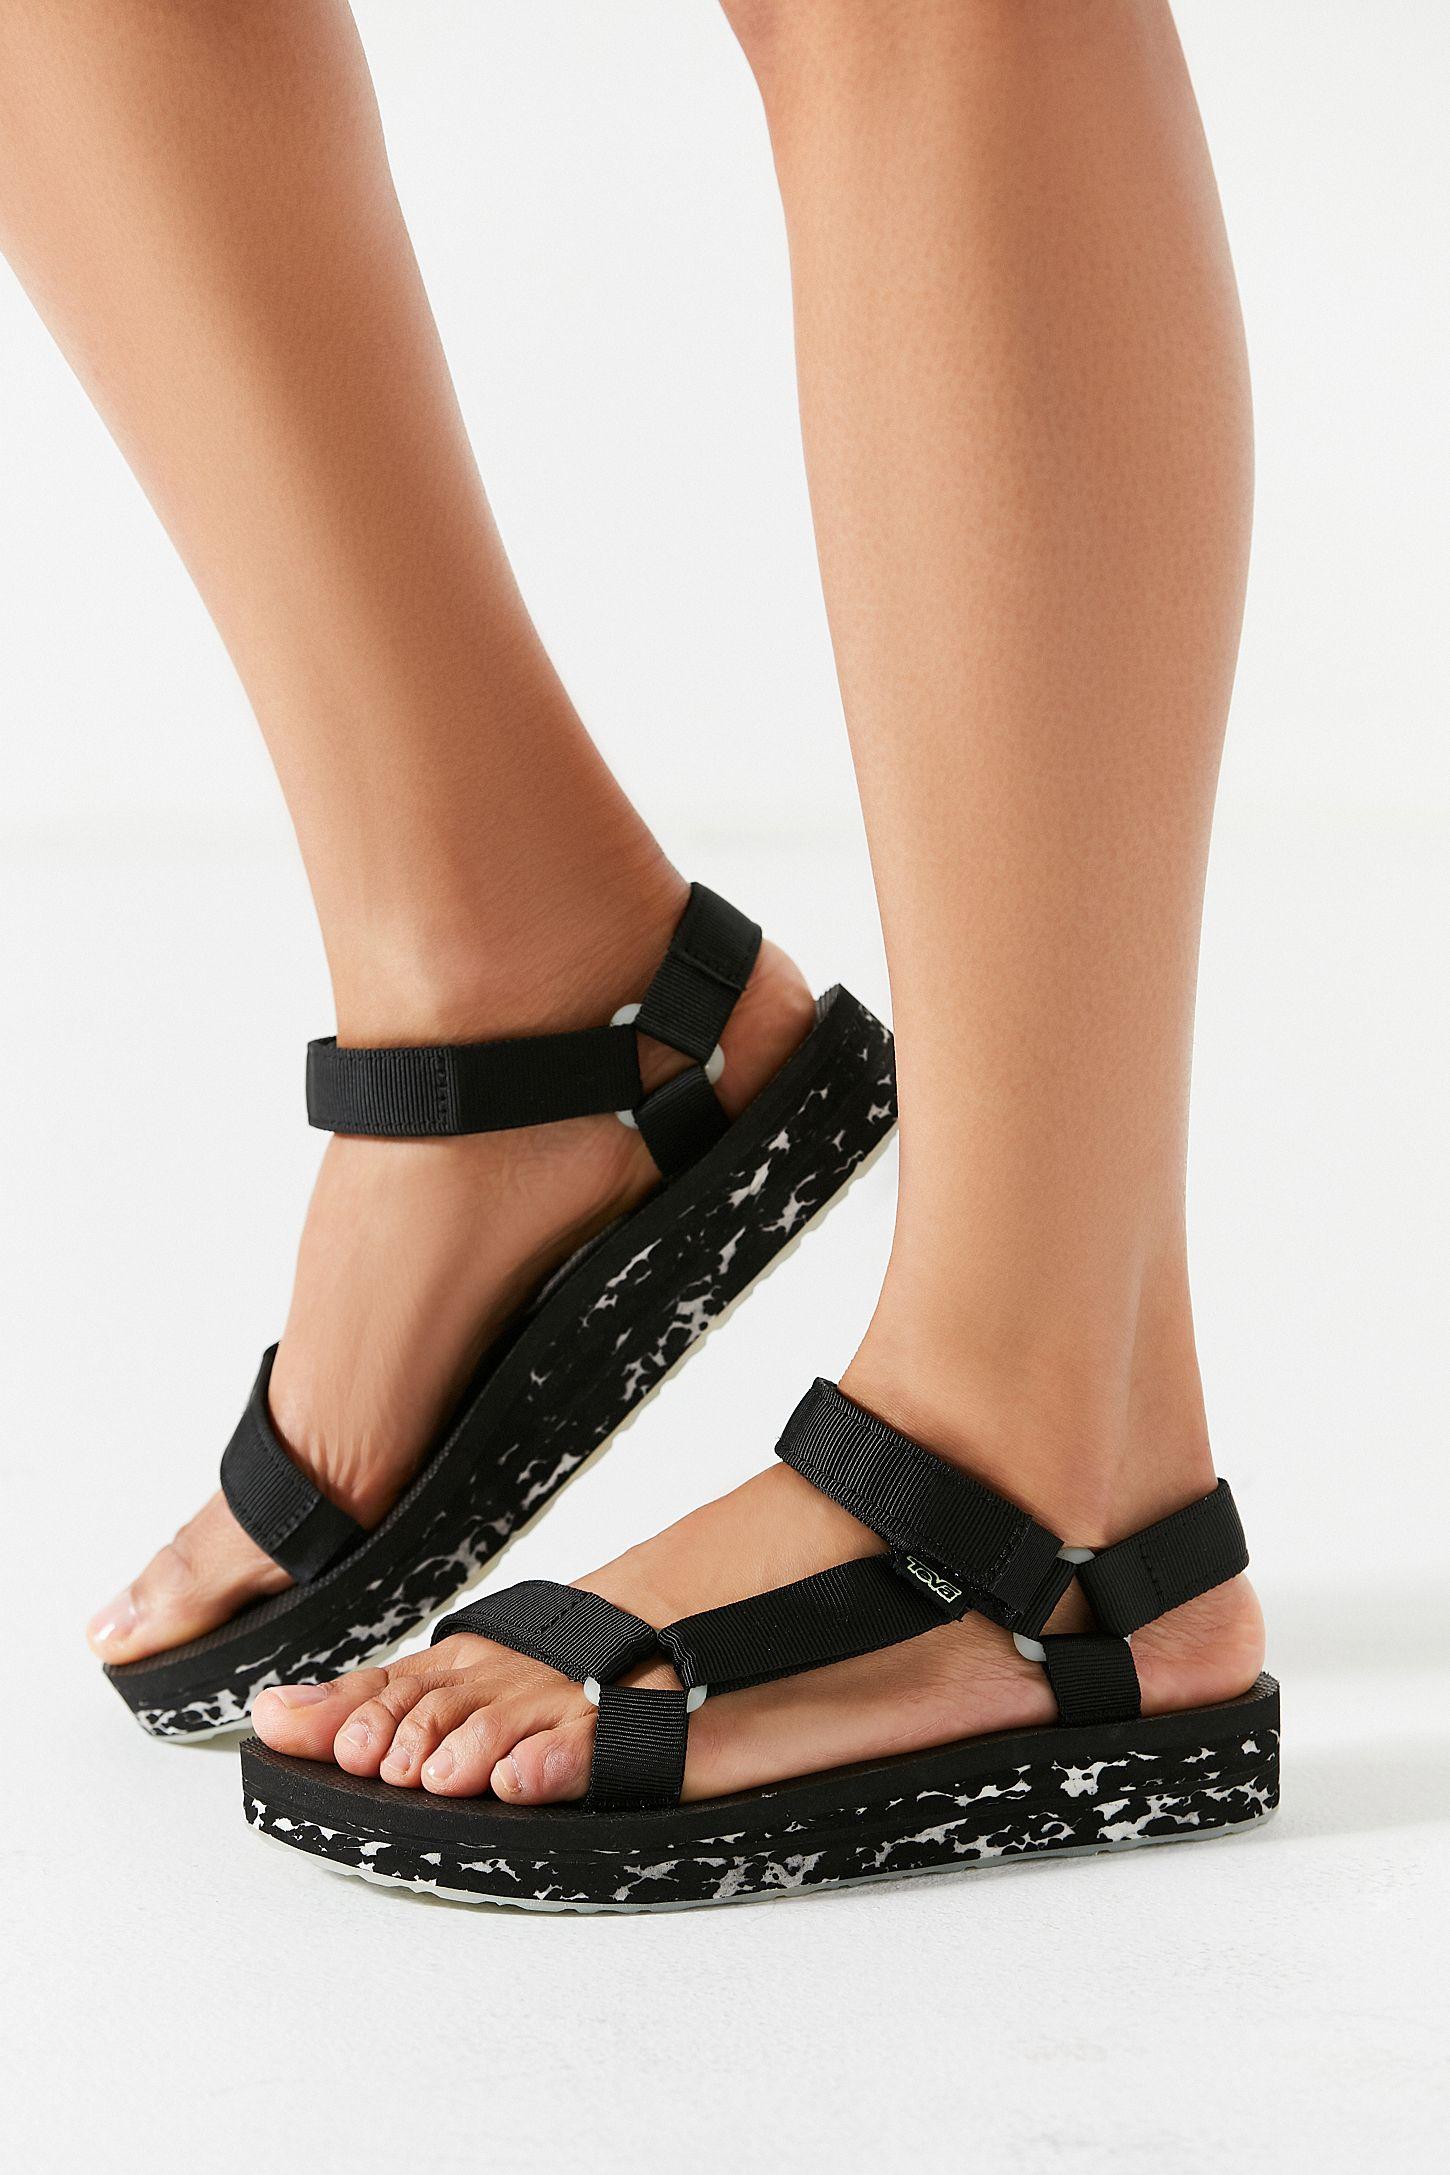 0a1186fdfc91 Teva Universal Glow-In-The-Dark Midform Sandal